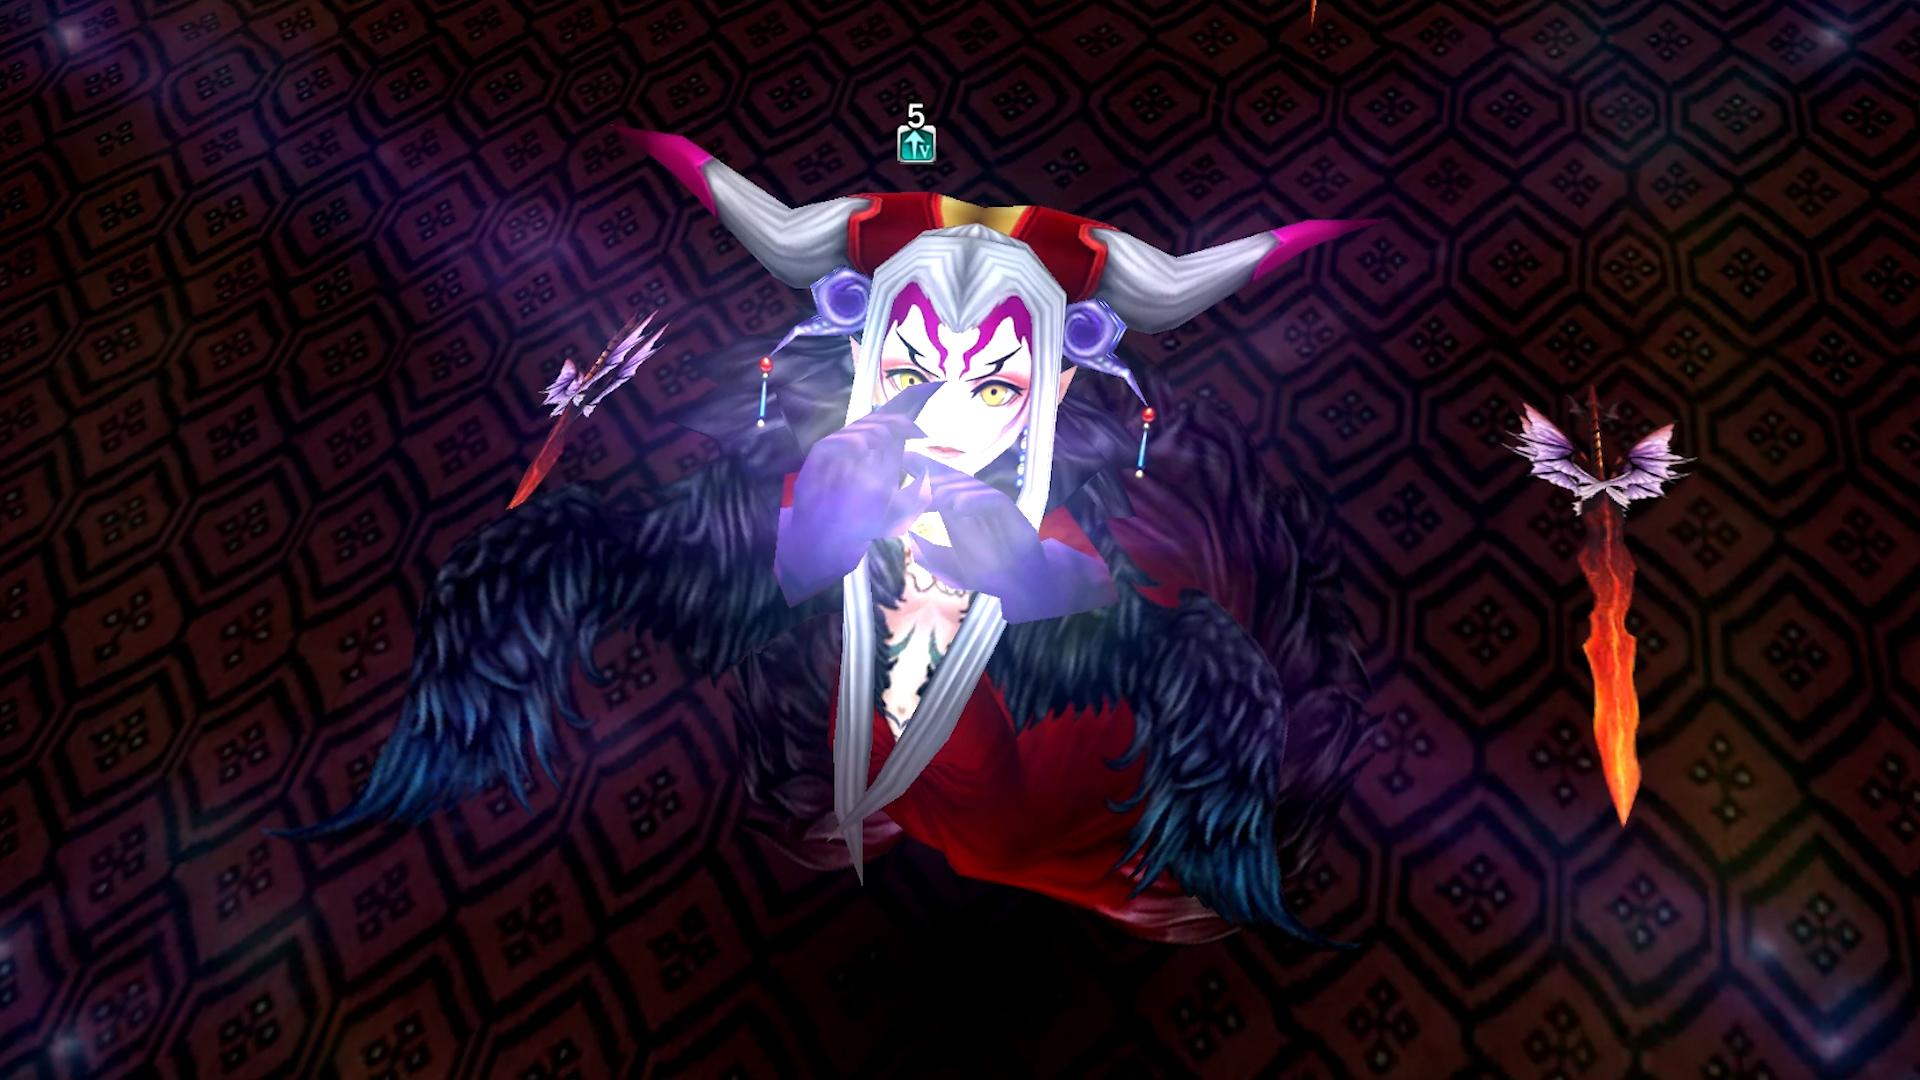 Ultimecia Will Make Her Dissidia Final Fantasy: Opera Omnia Debut on November 27, 2019